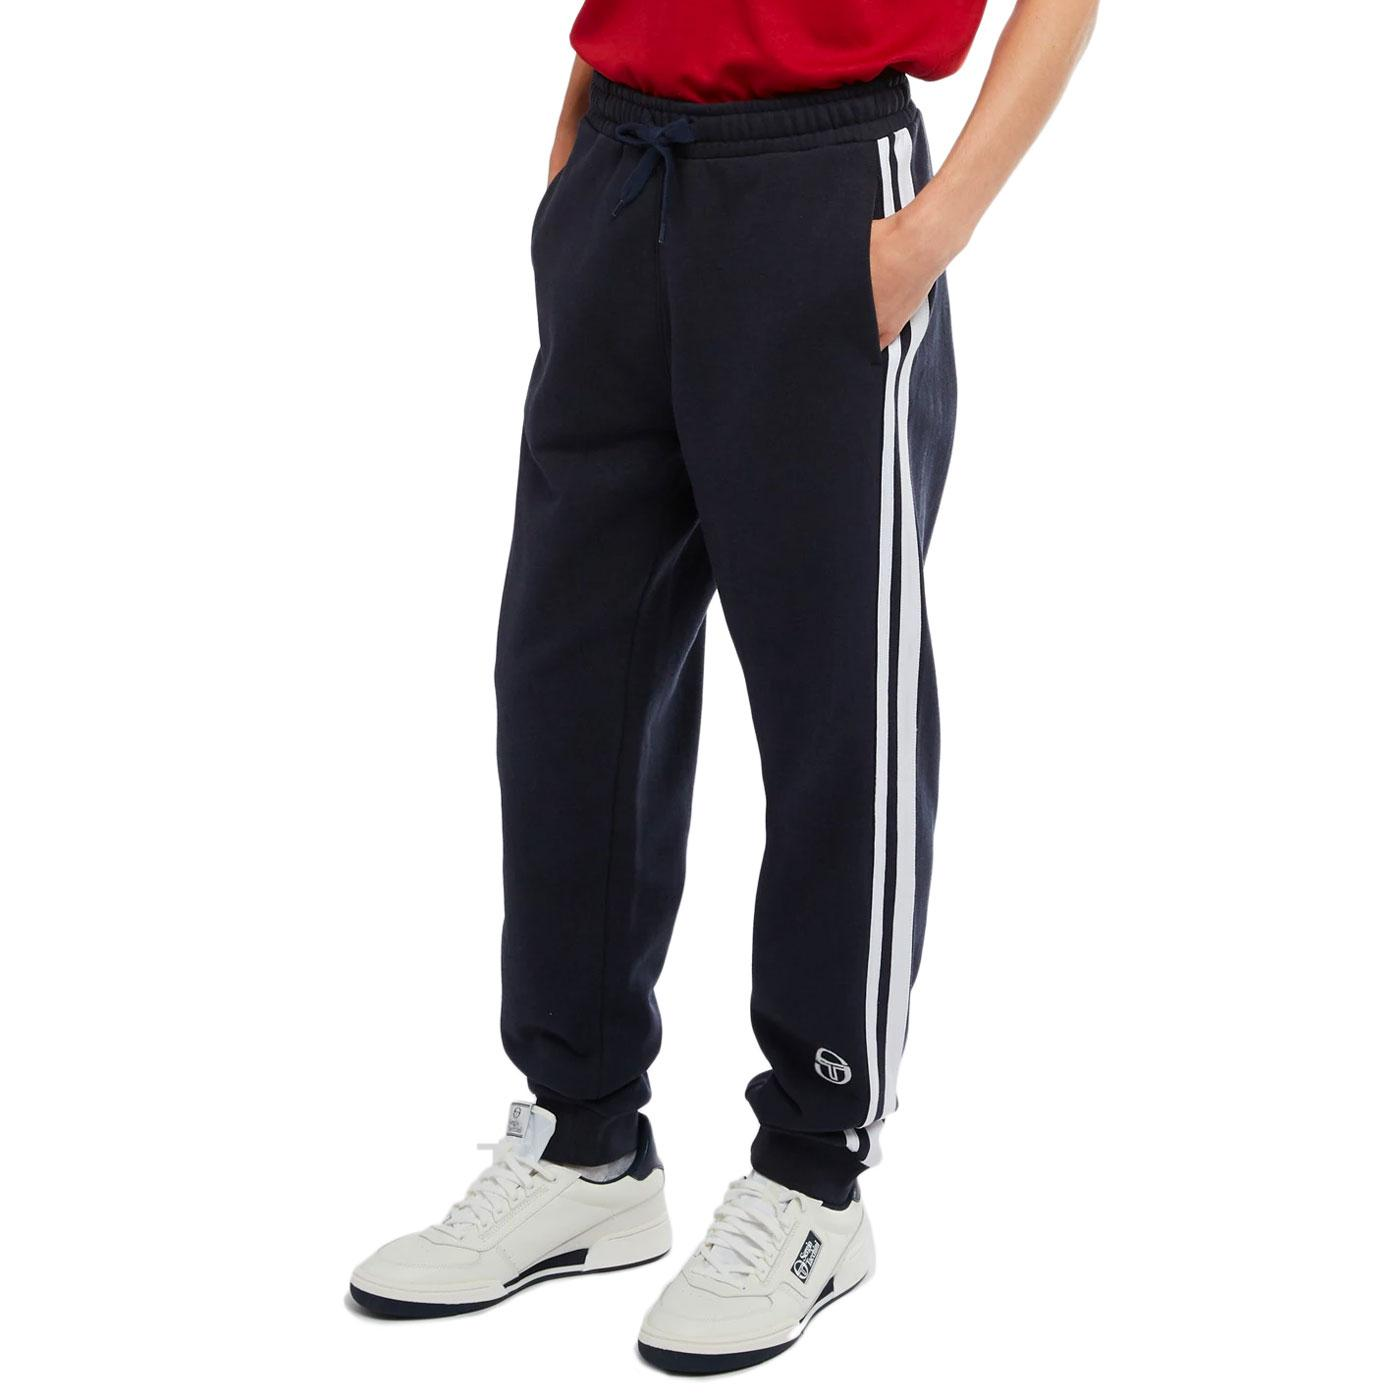 Damarindo SERGIO TACCHINI 80s Fleece Pants in Navy